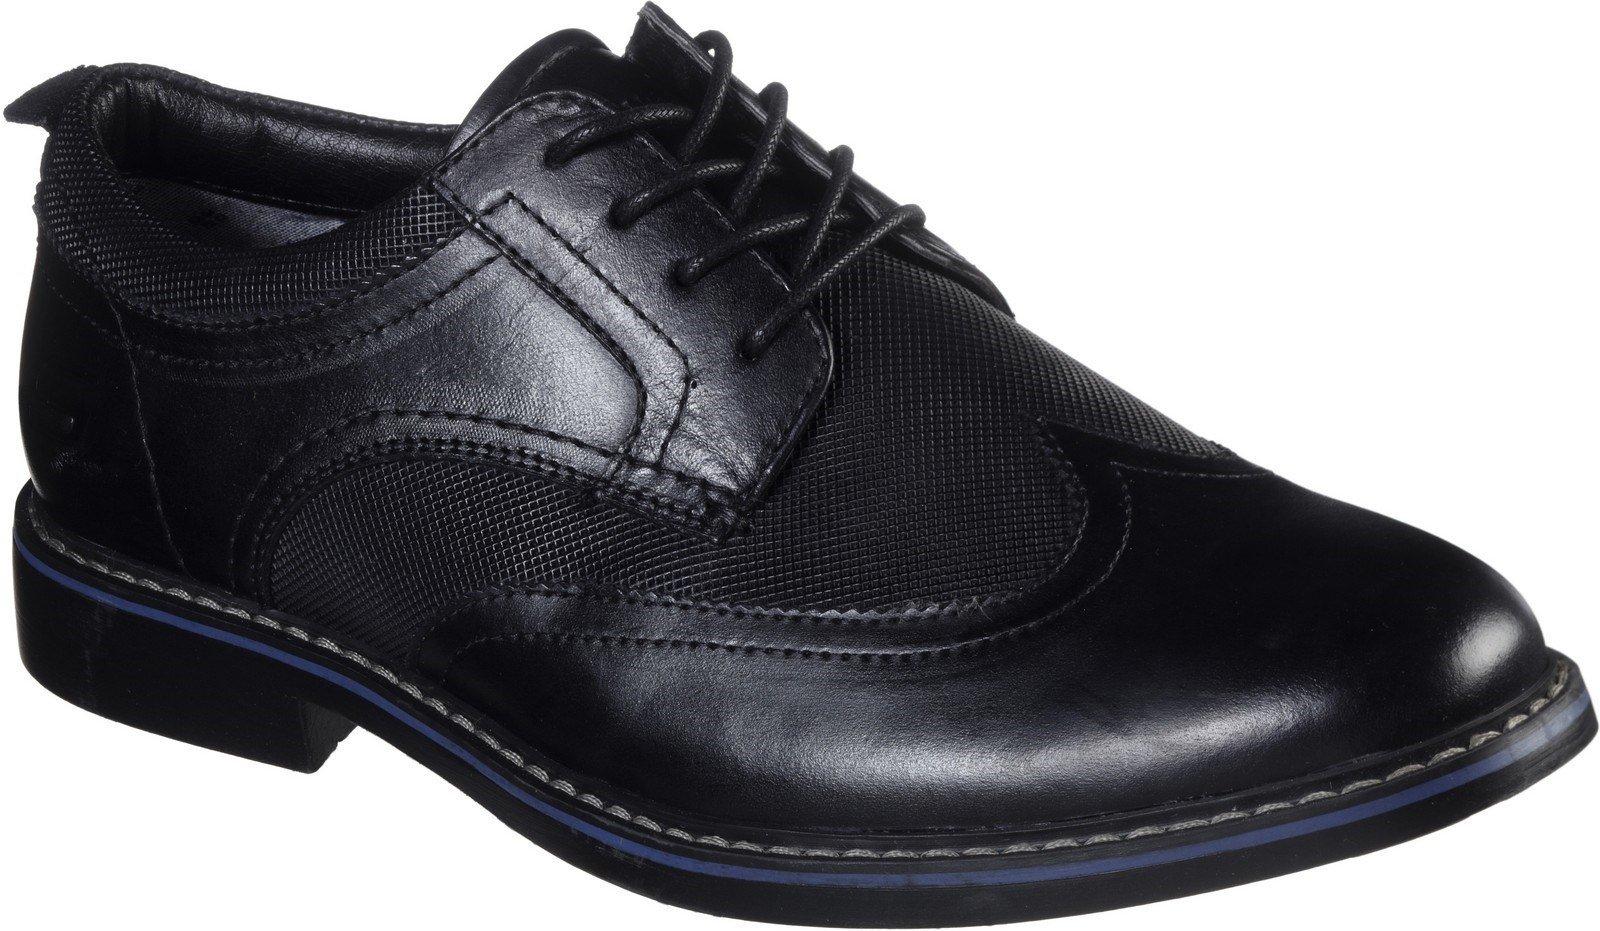 Skechers Men's Bregman Modeso Lace Up Shoe Various Colours 30747 - Black 6